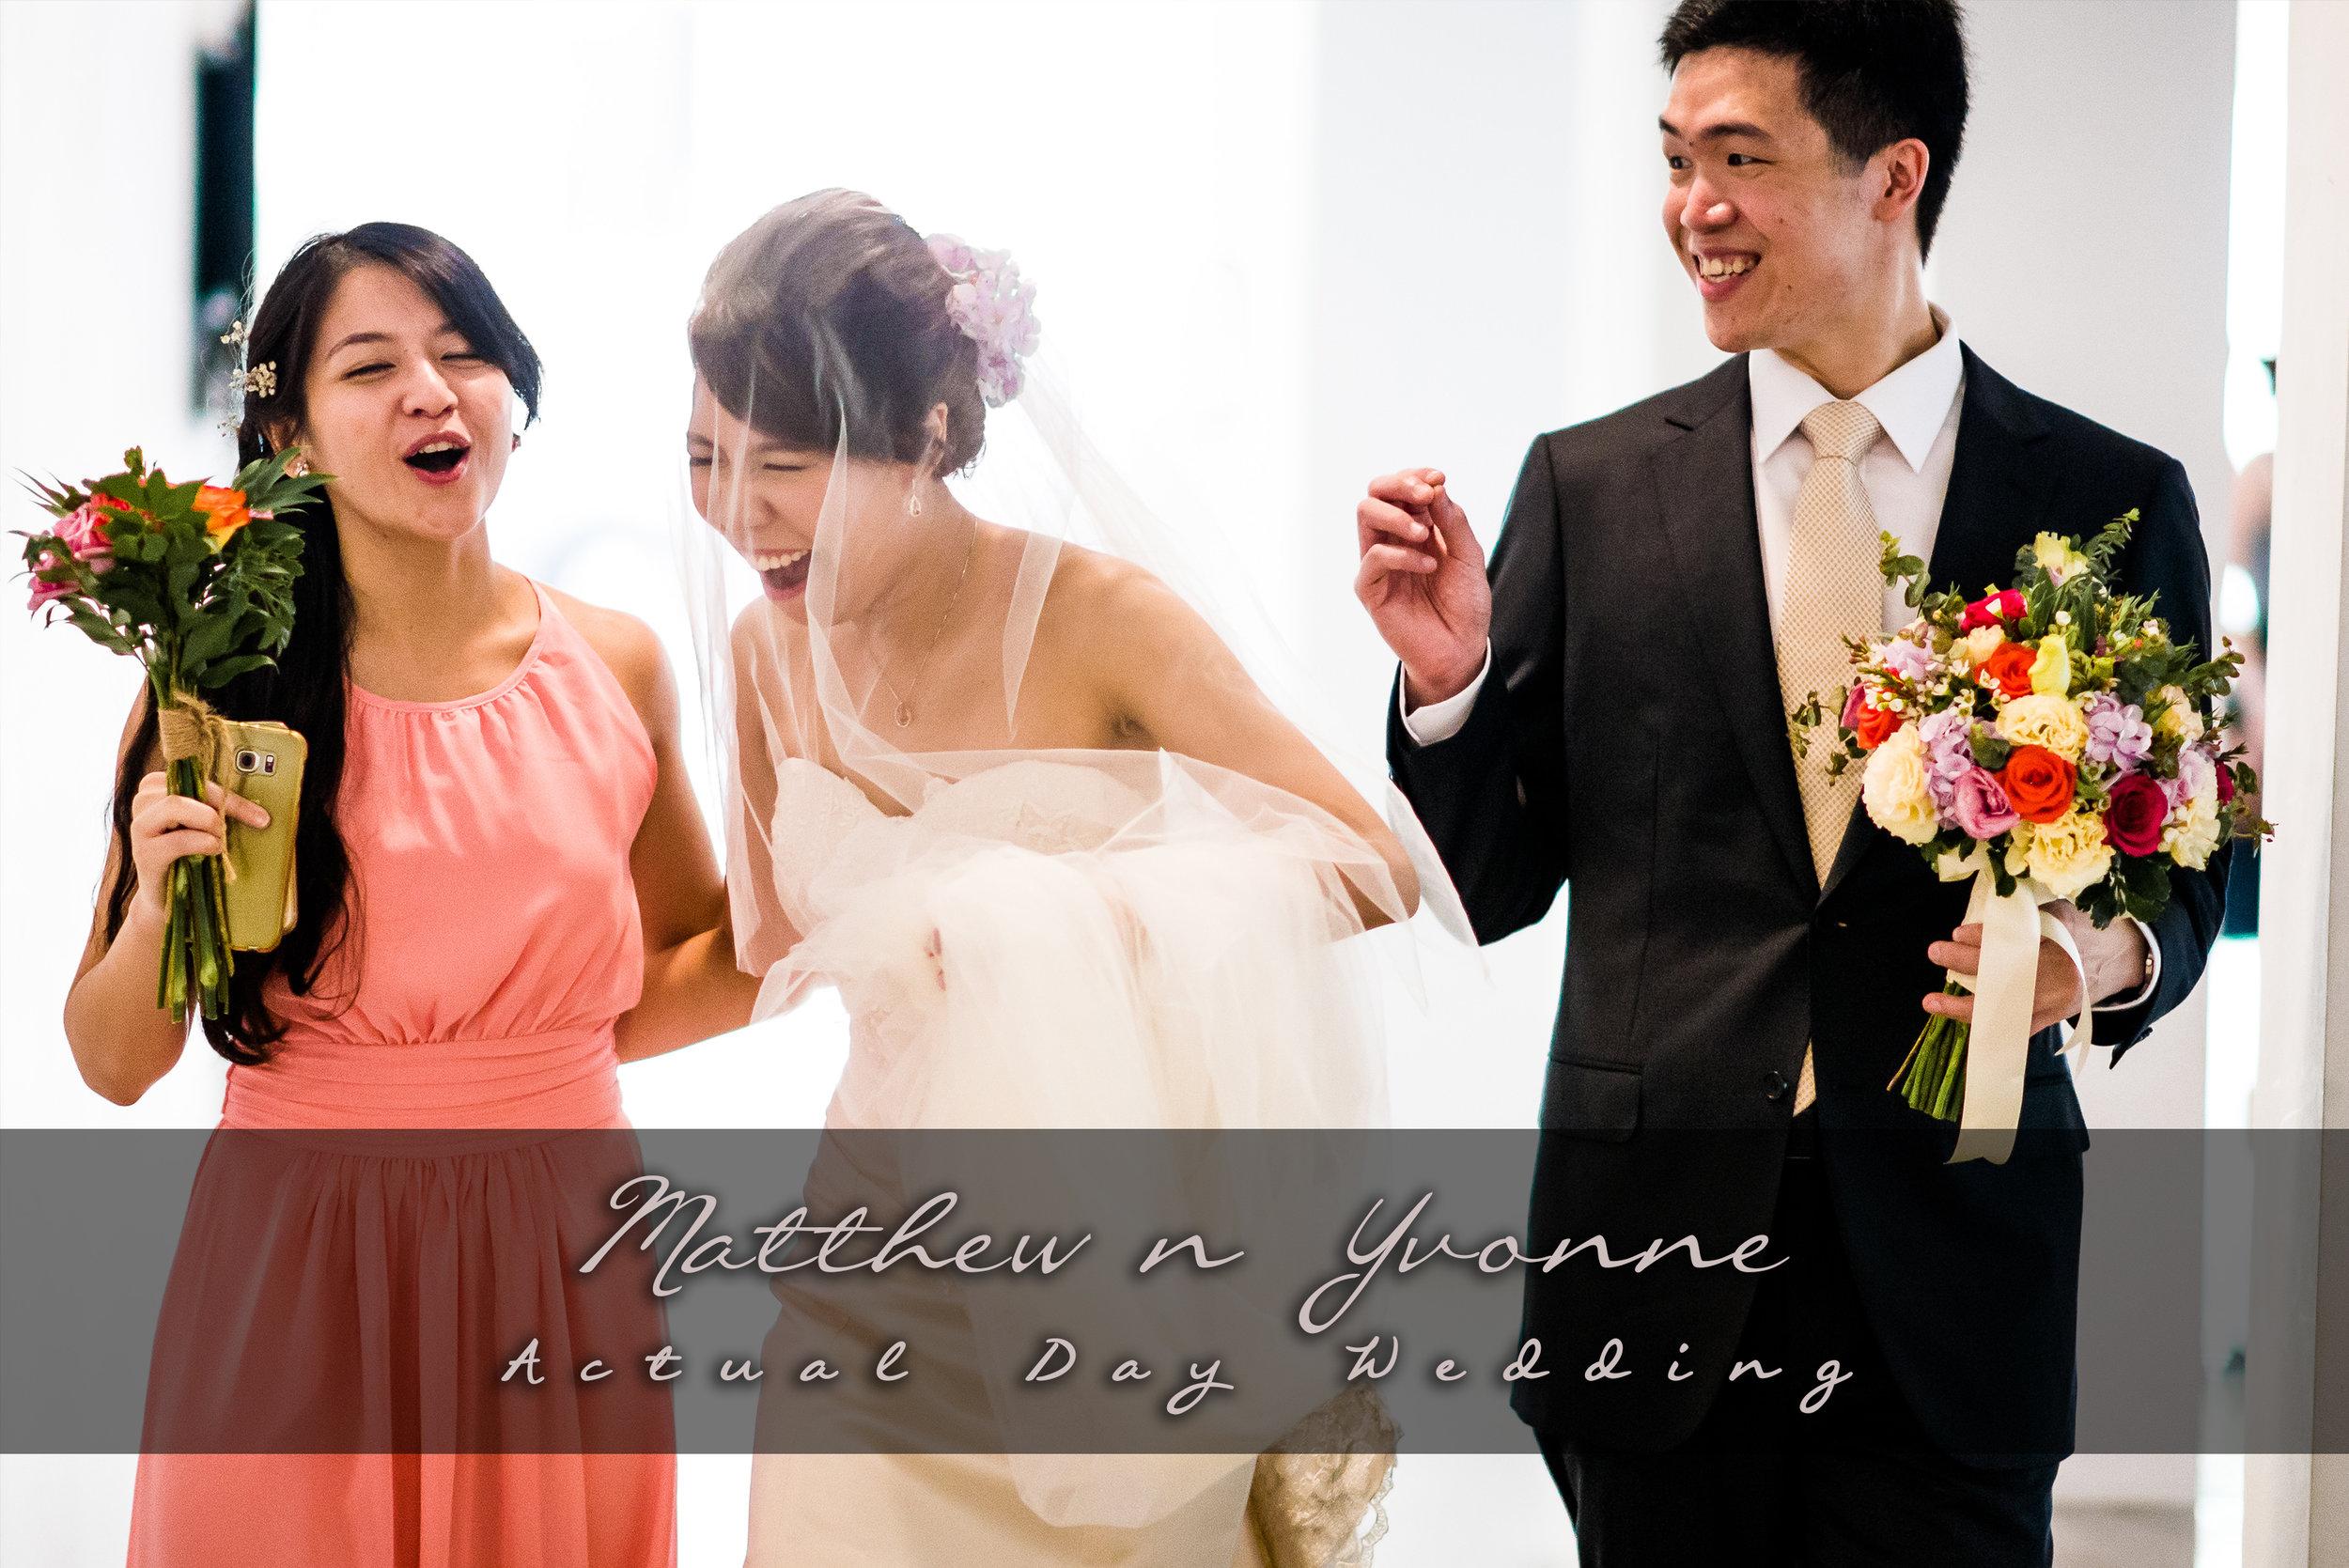 Singapore Church Wedding Ceremony